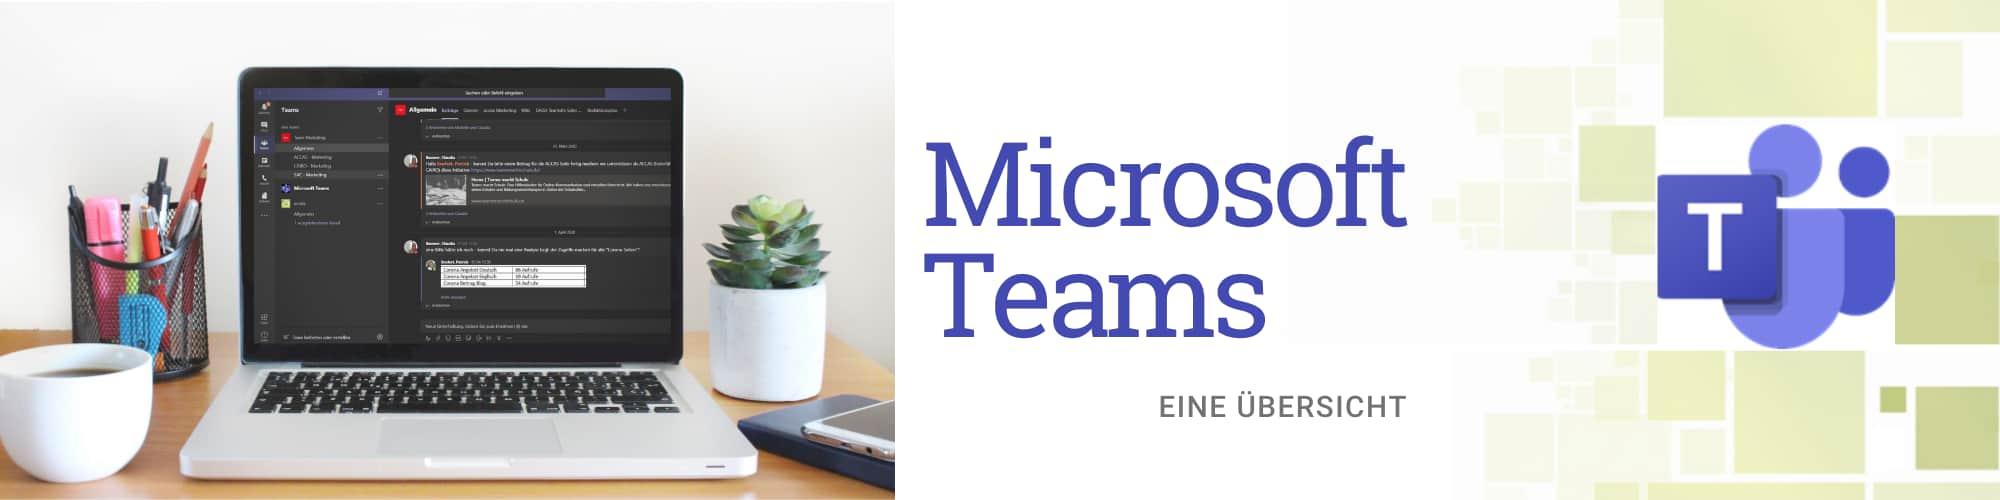 Microsoft Teams Übersicht acoris